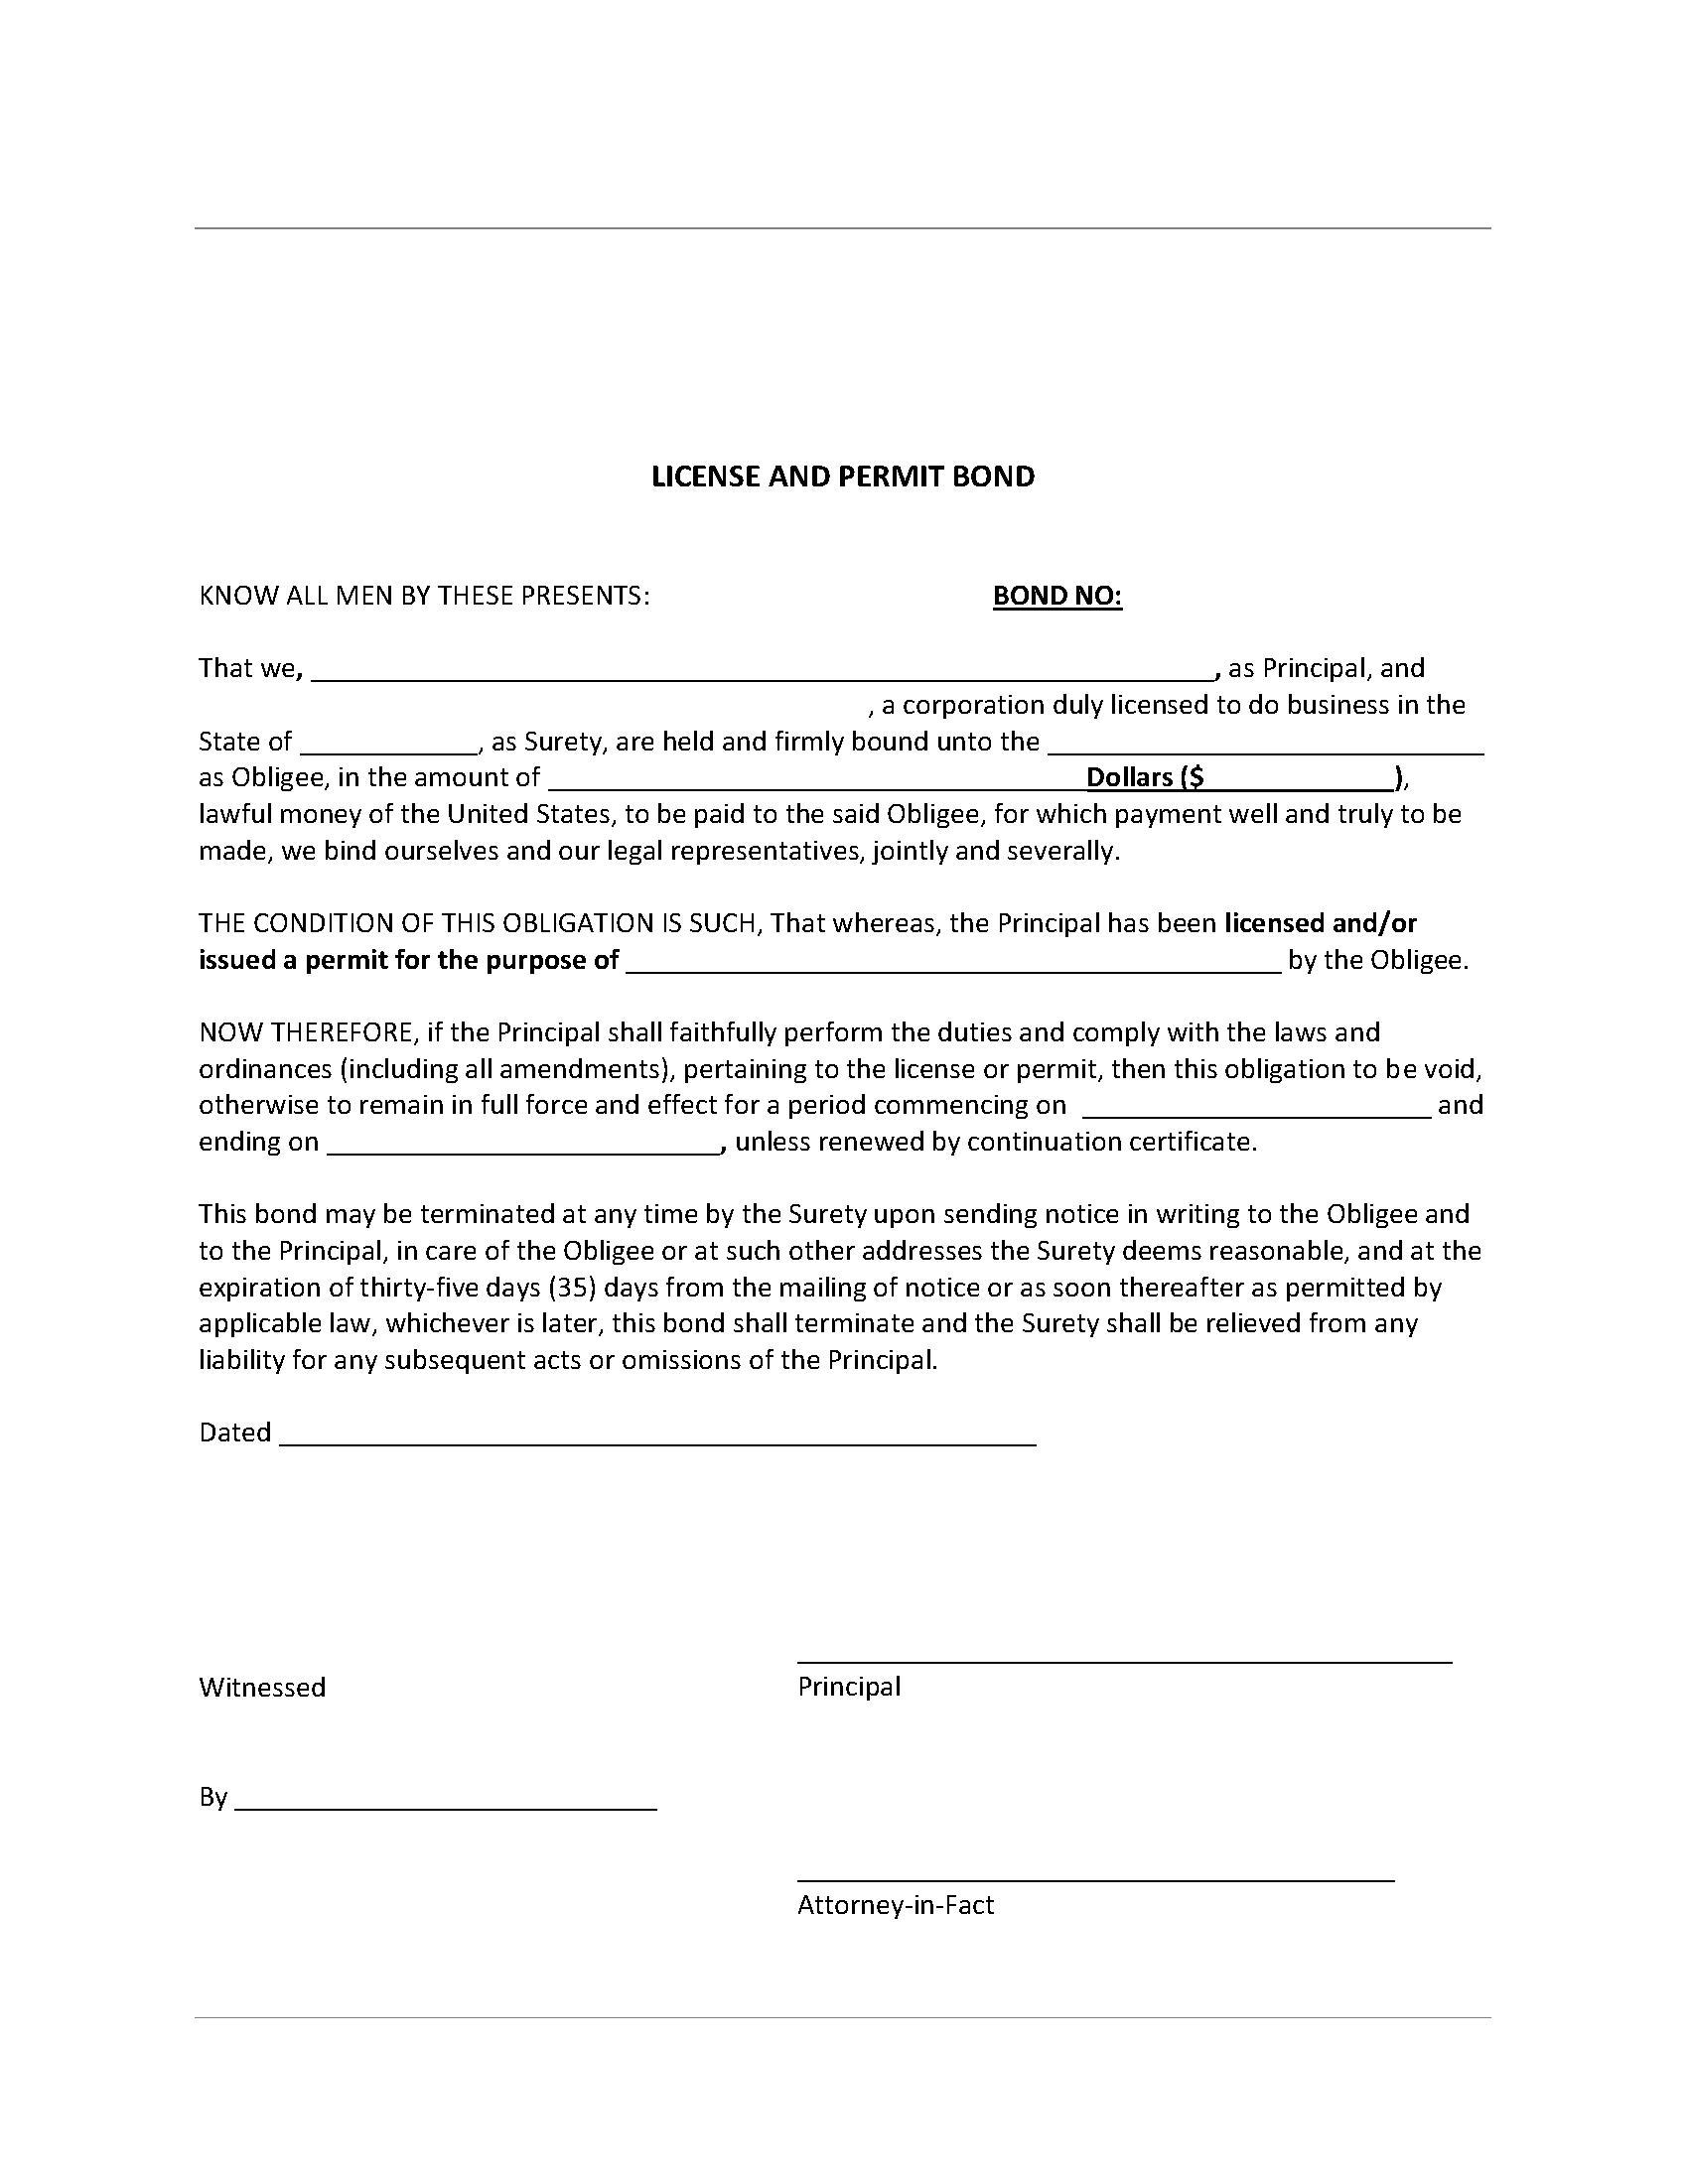 Randolph - County License/Permit sample image